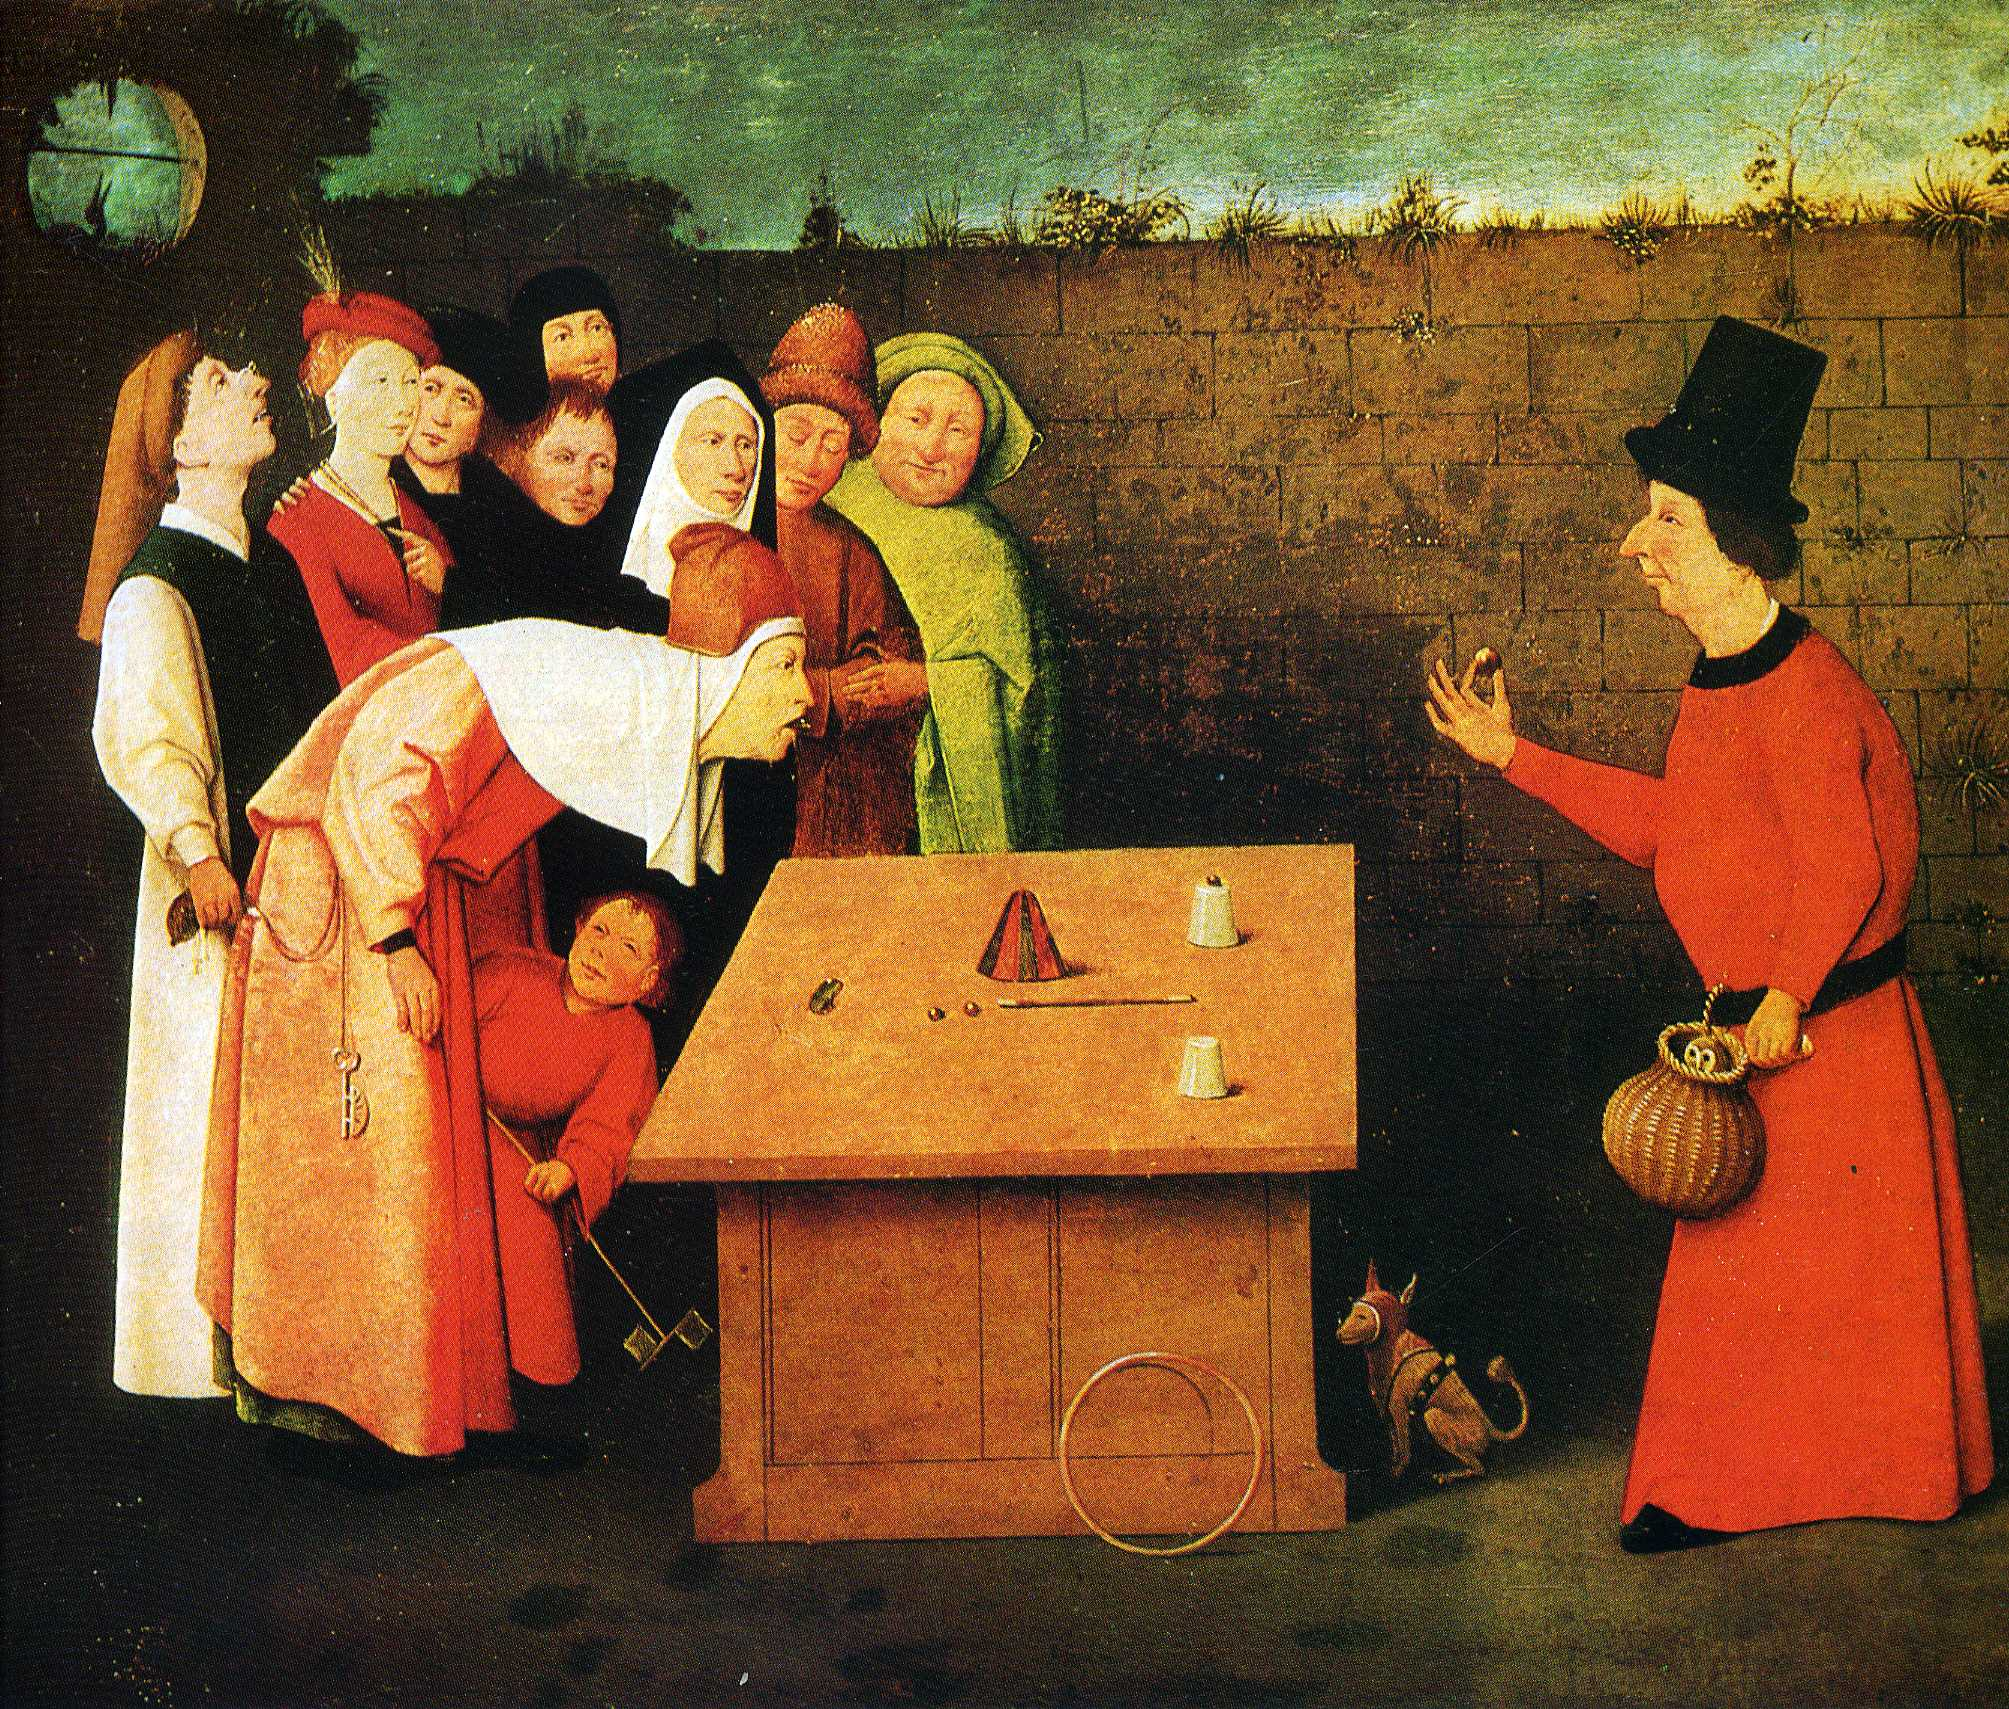 """The Conjurer"" by Hieronymus Bosch"